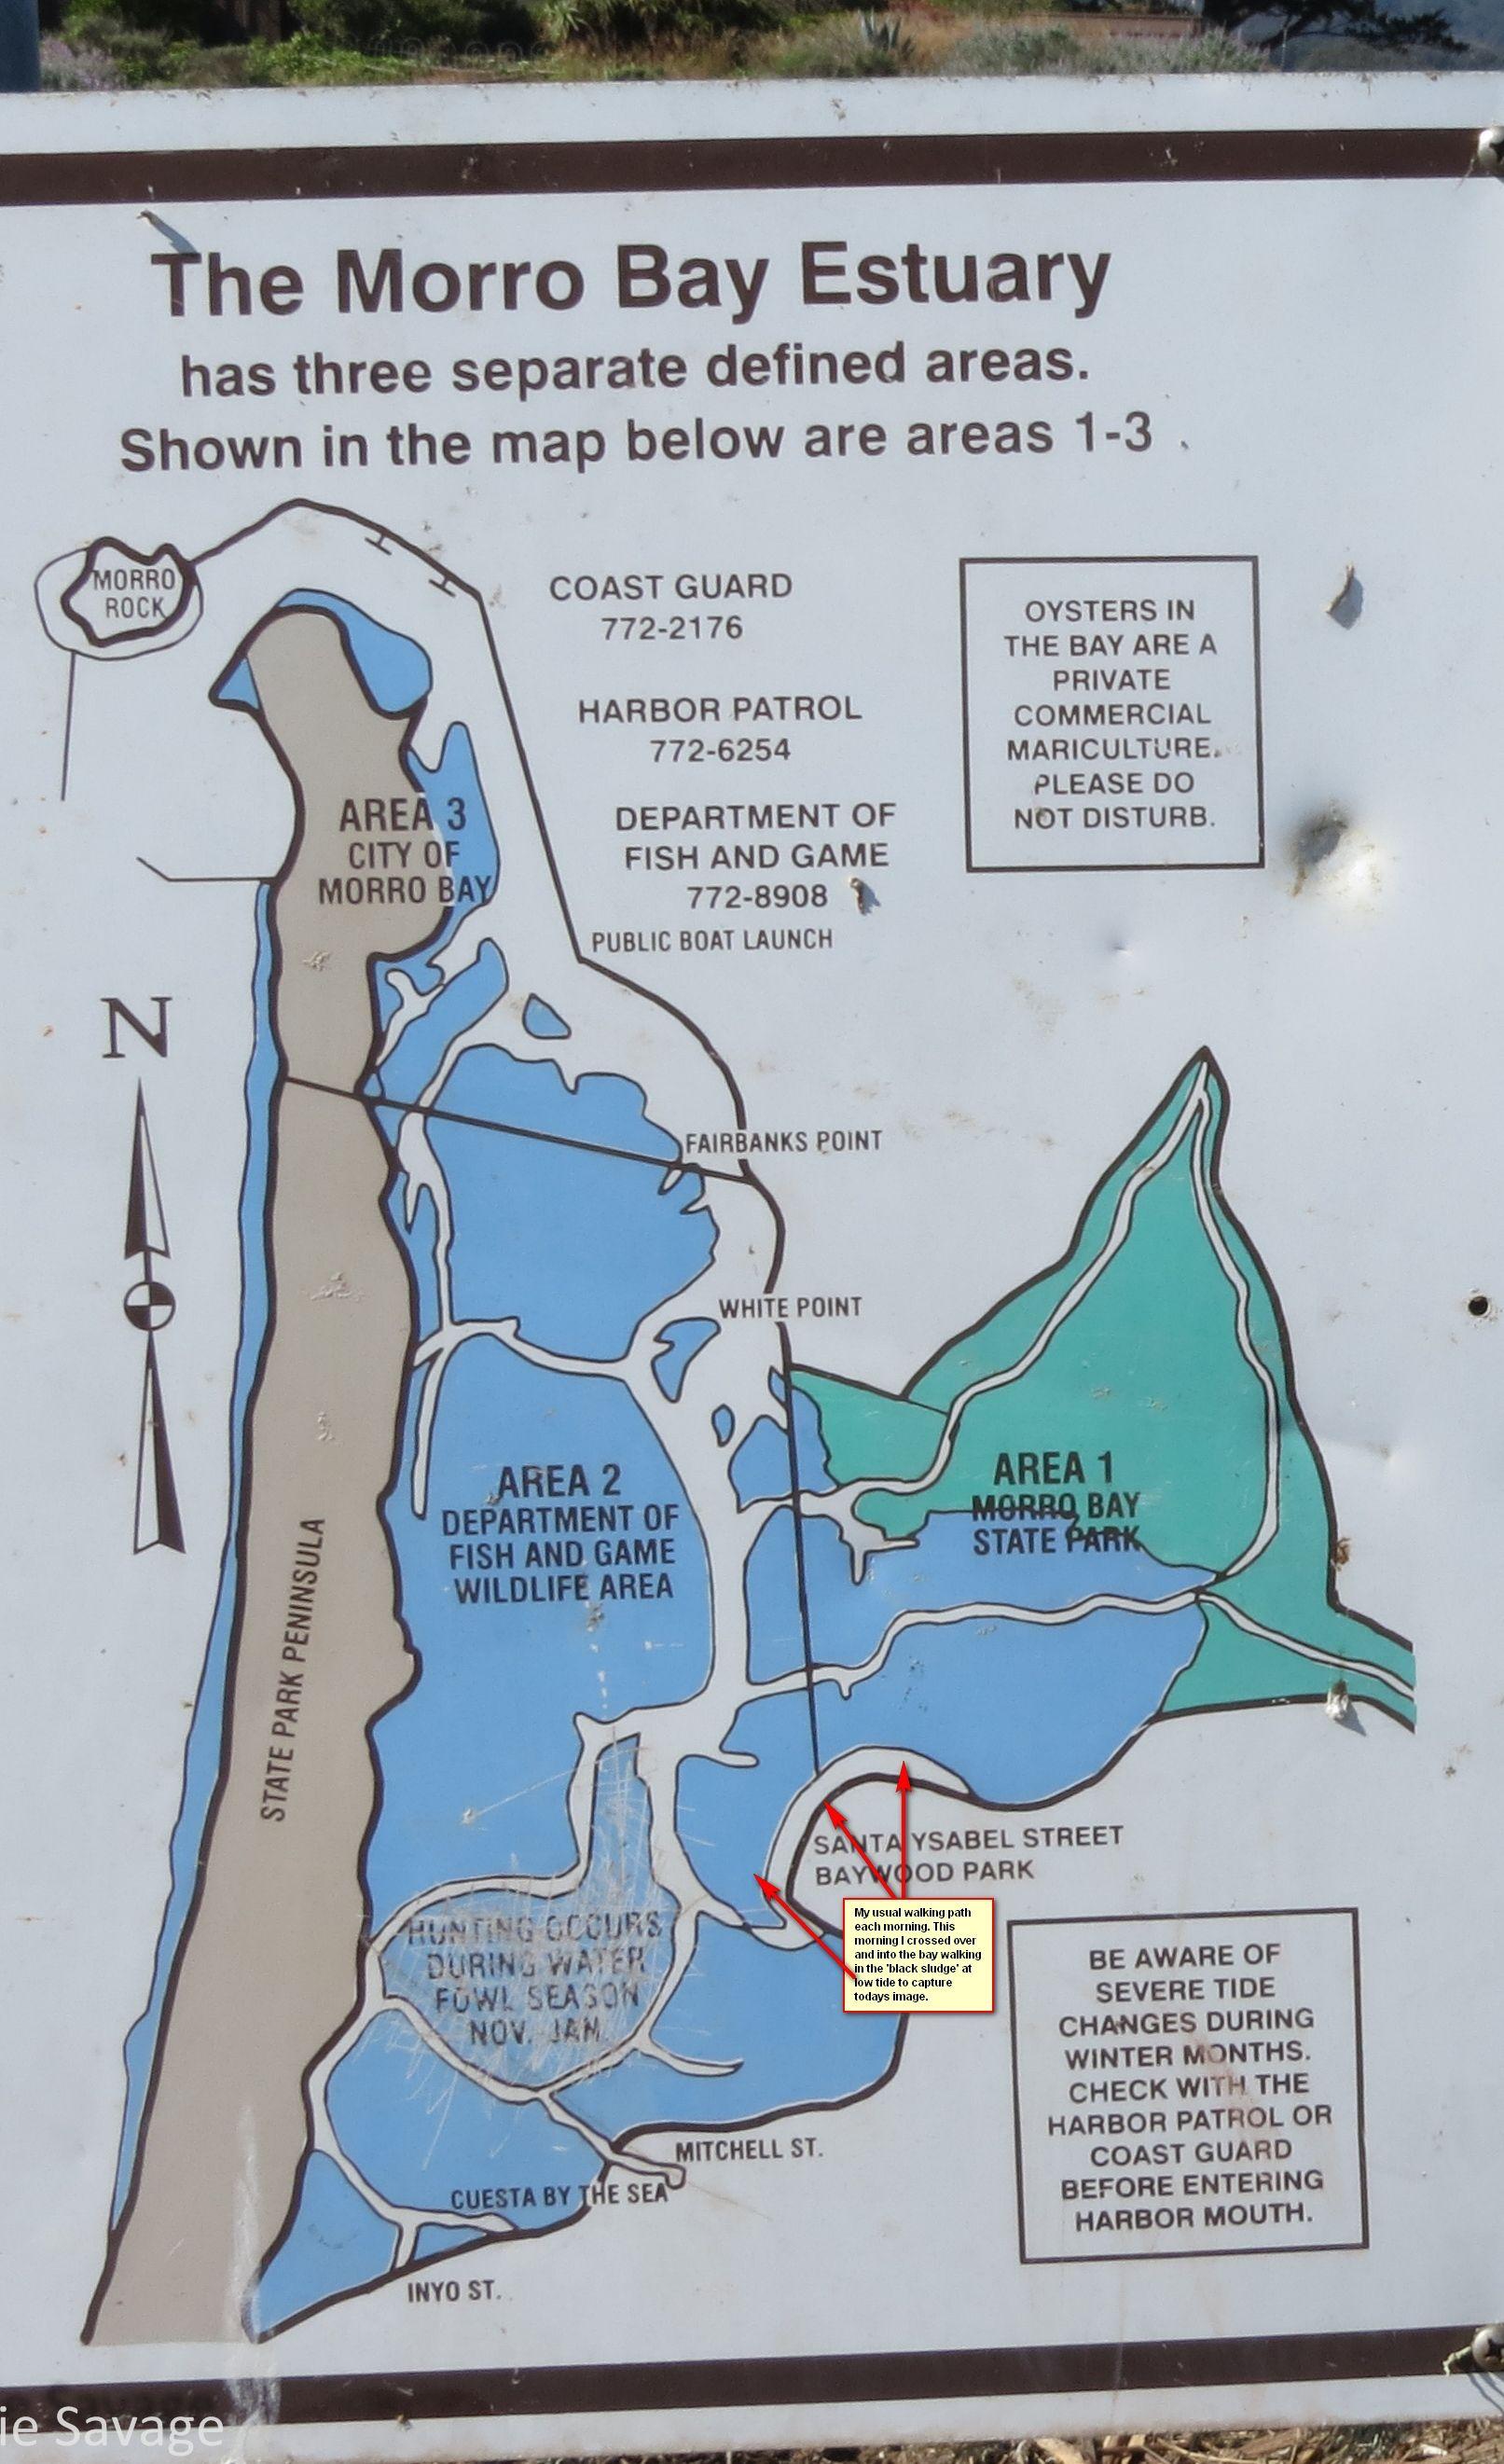 Morro bay tide chart images chart design ideas morro bay tide chart choice image chart design ideas morro bay estuary map google search camp nvjuhfo Gallery